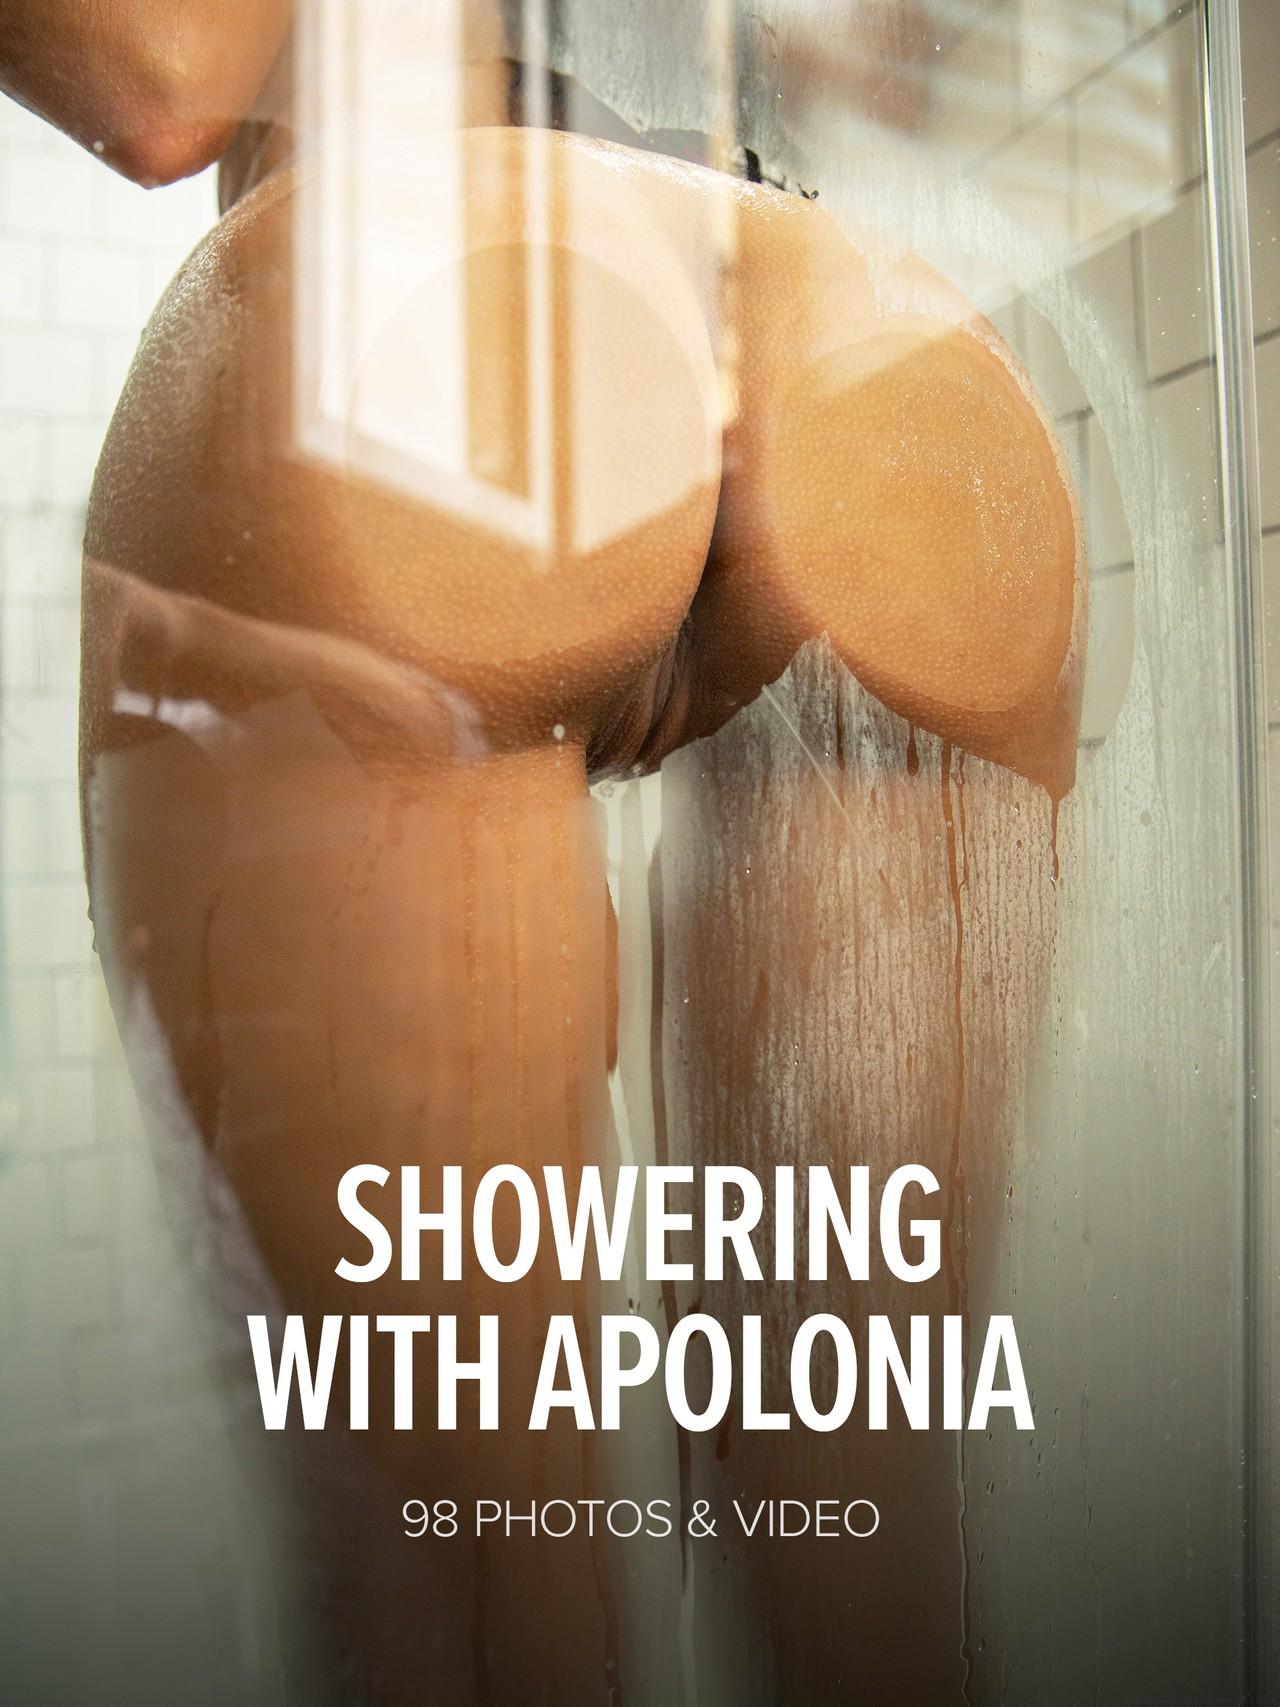 Apolonia: Showering With Apolonia